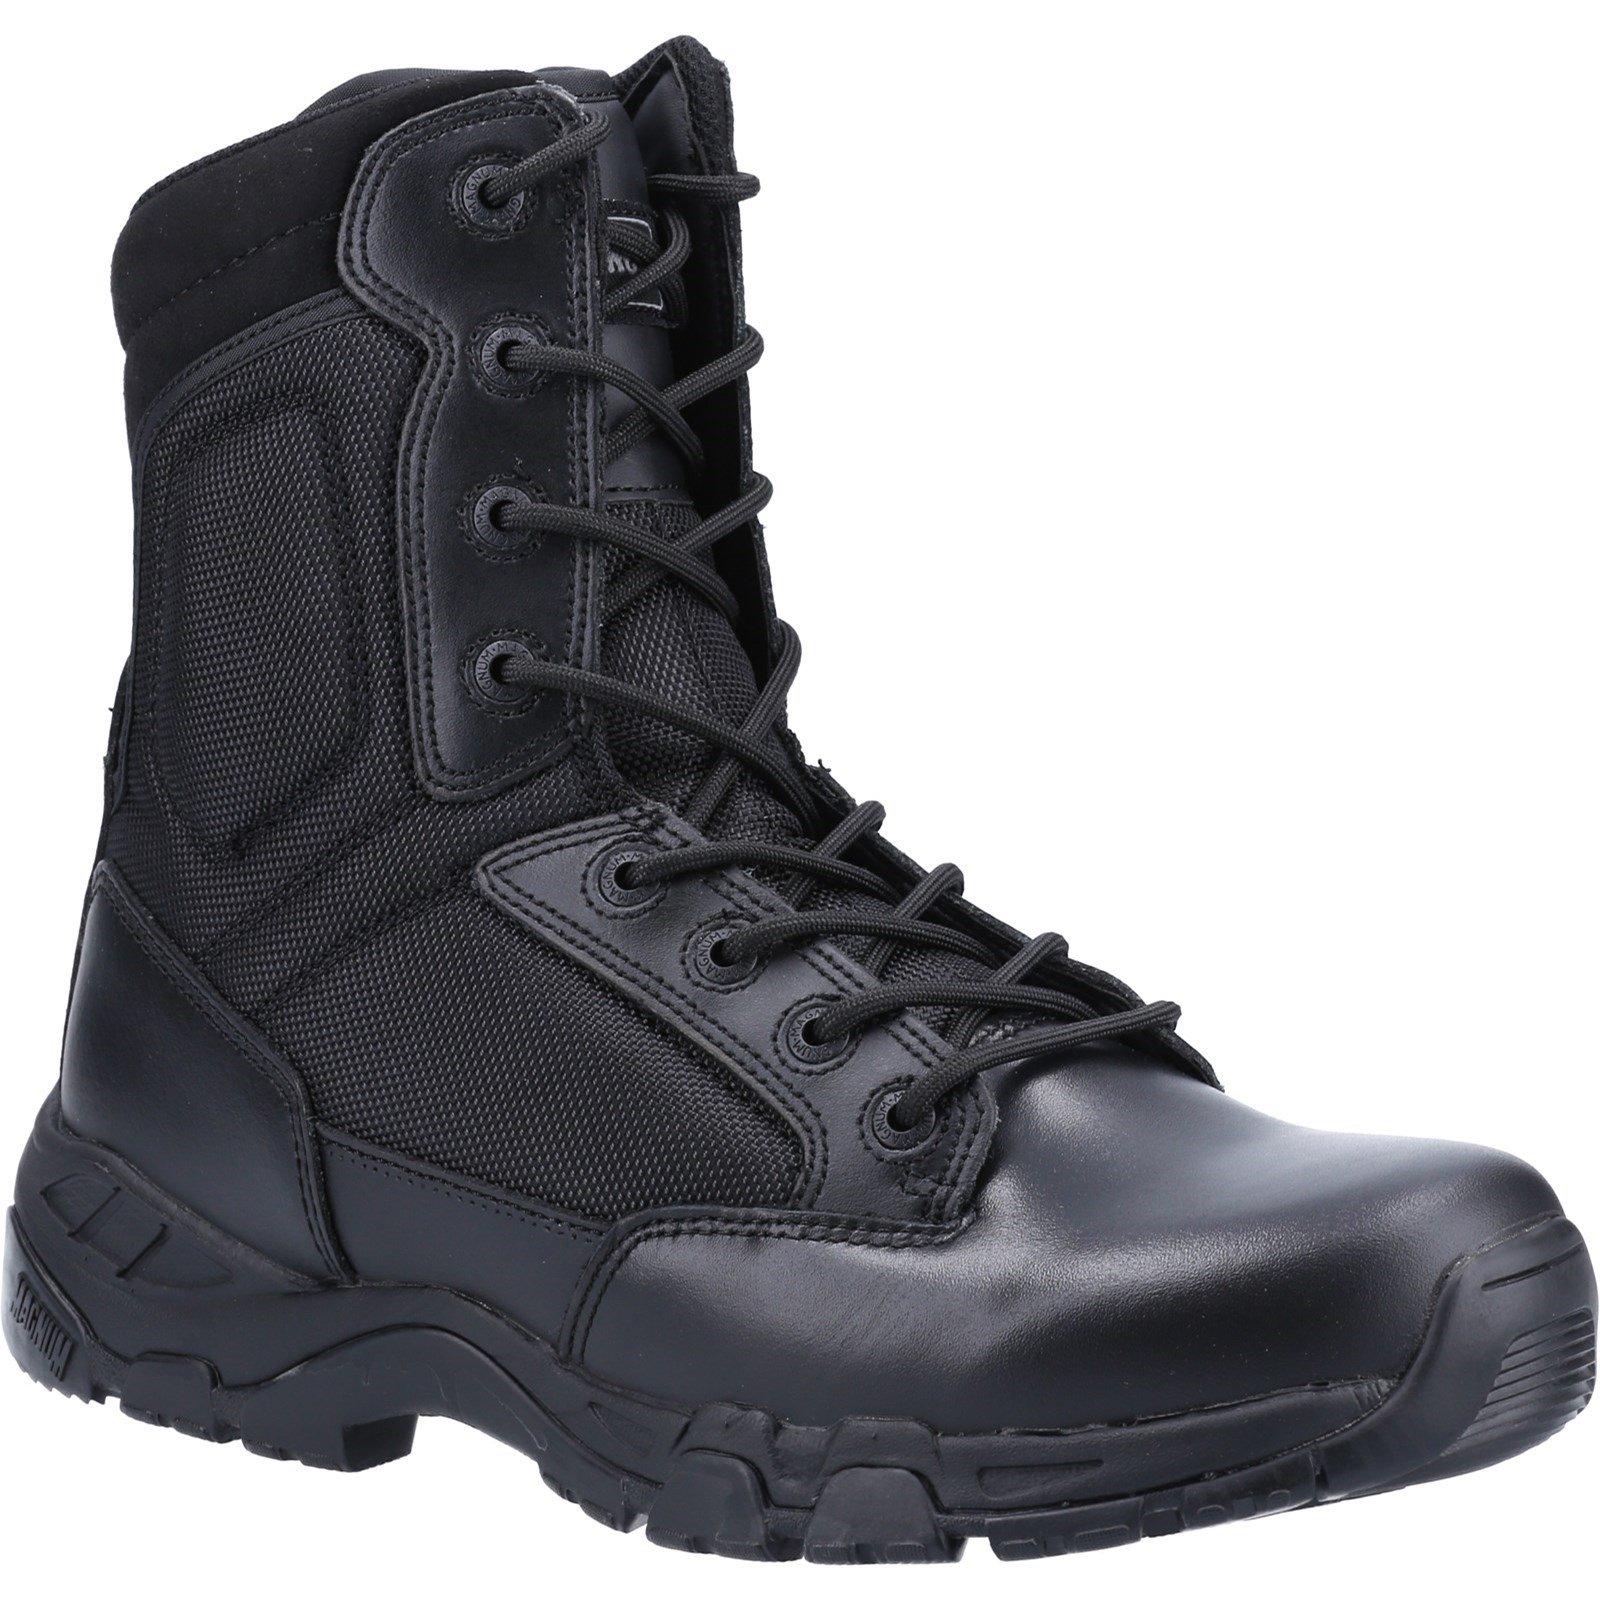 Magnum Unisex Viper Pro Plus Side-Zip Uniform Boot Black 33533 - Black 4